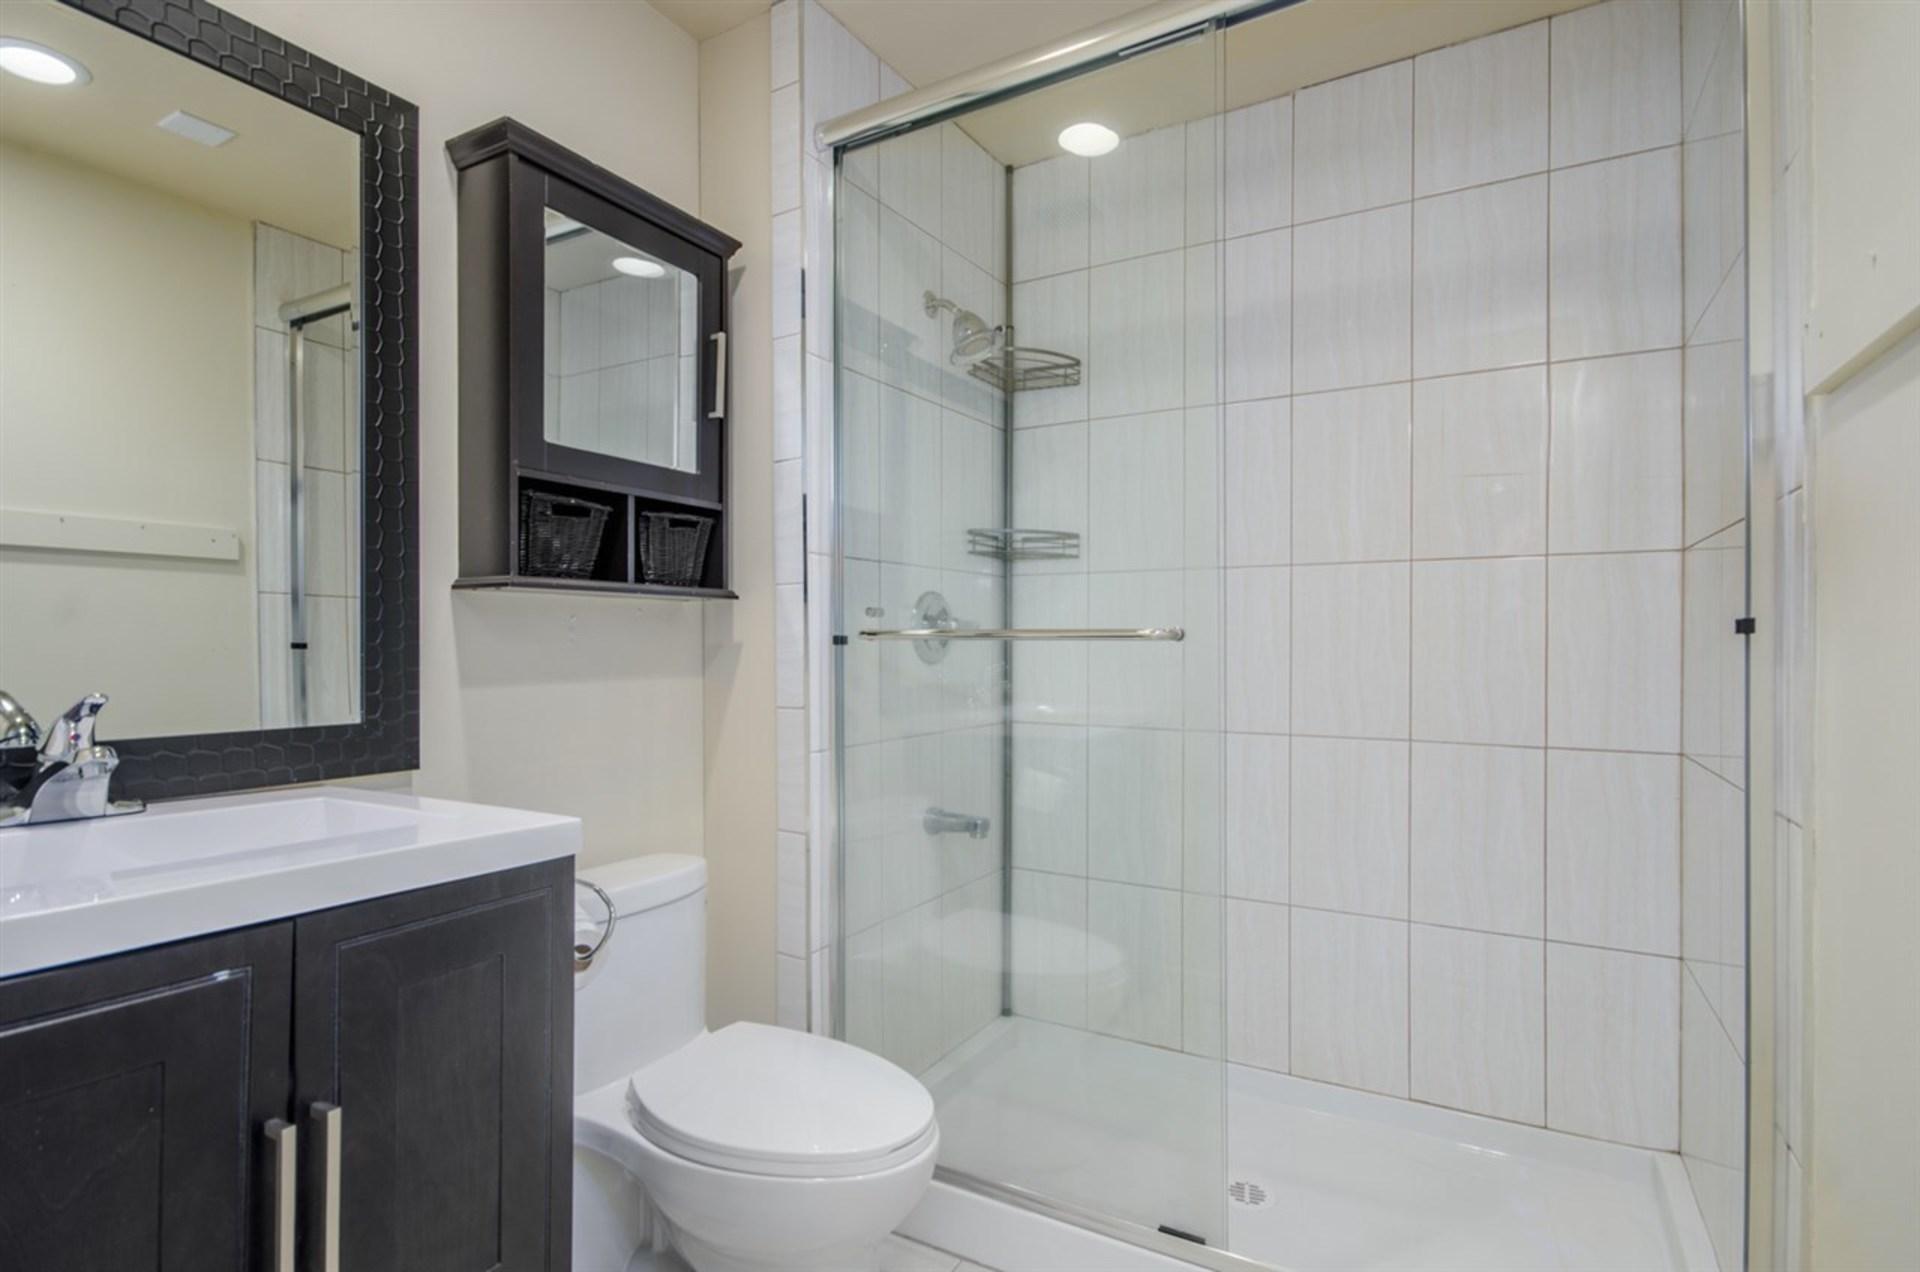 15298-28-avenue-king-george-corridor-south-surrey-white-rock-11 at 15298 28 Avenue, King George Corridor, South Surrey White Rock